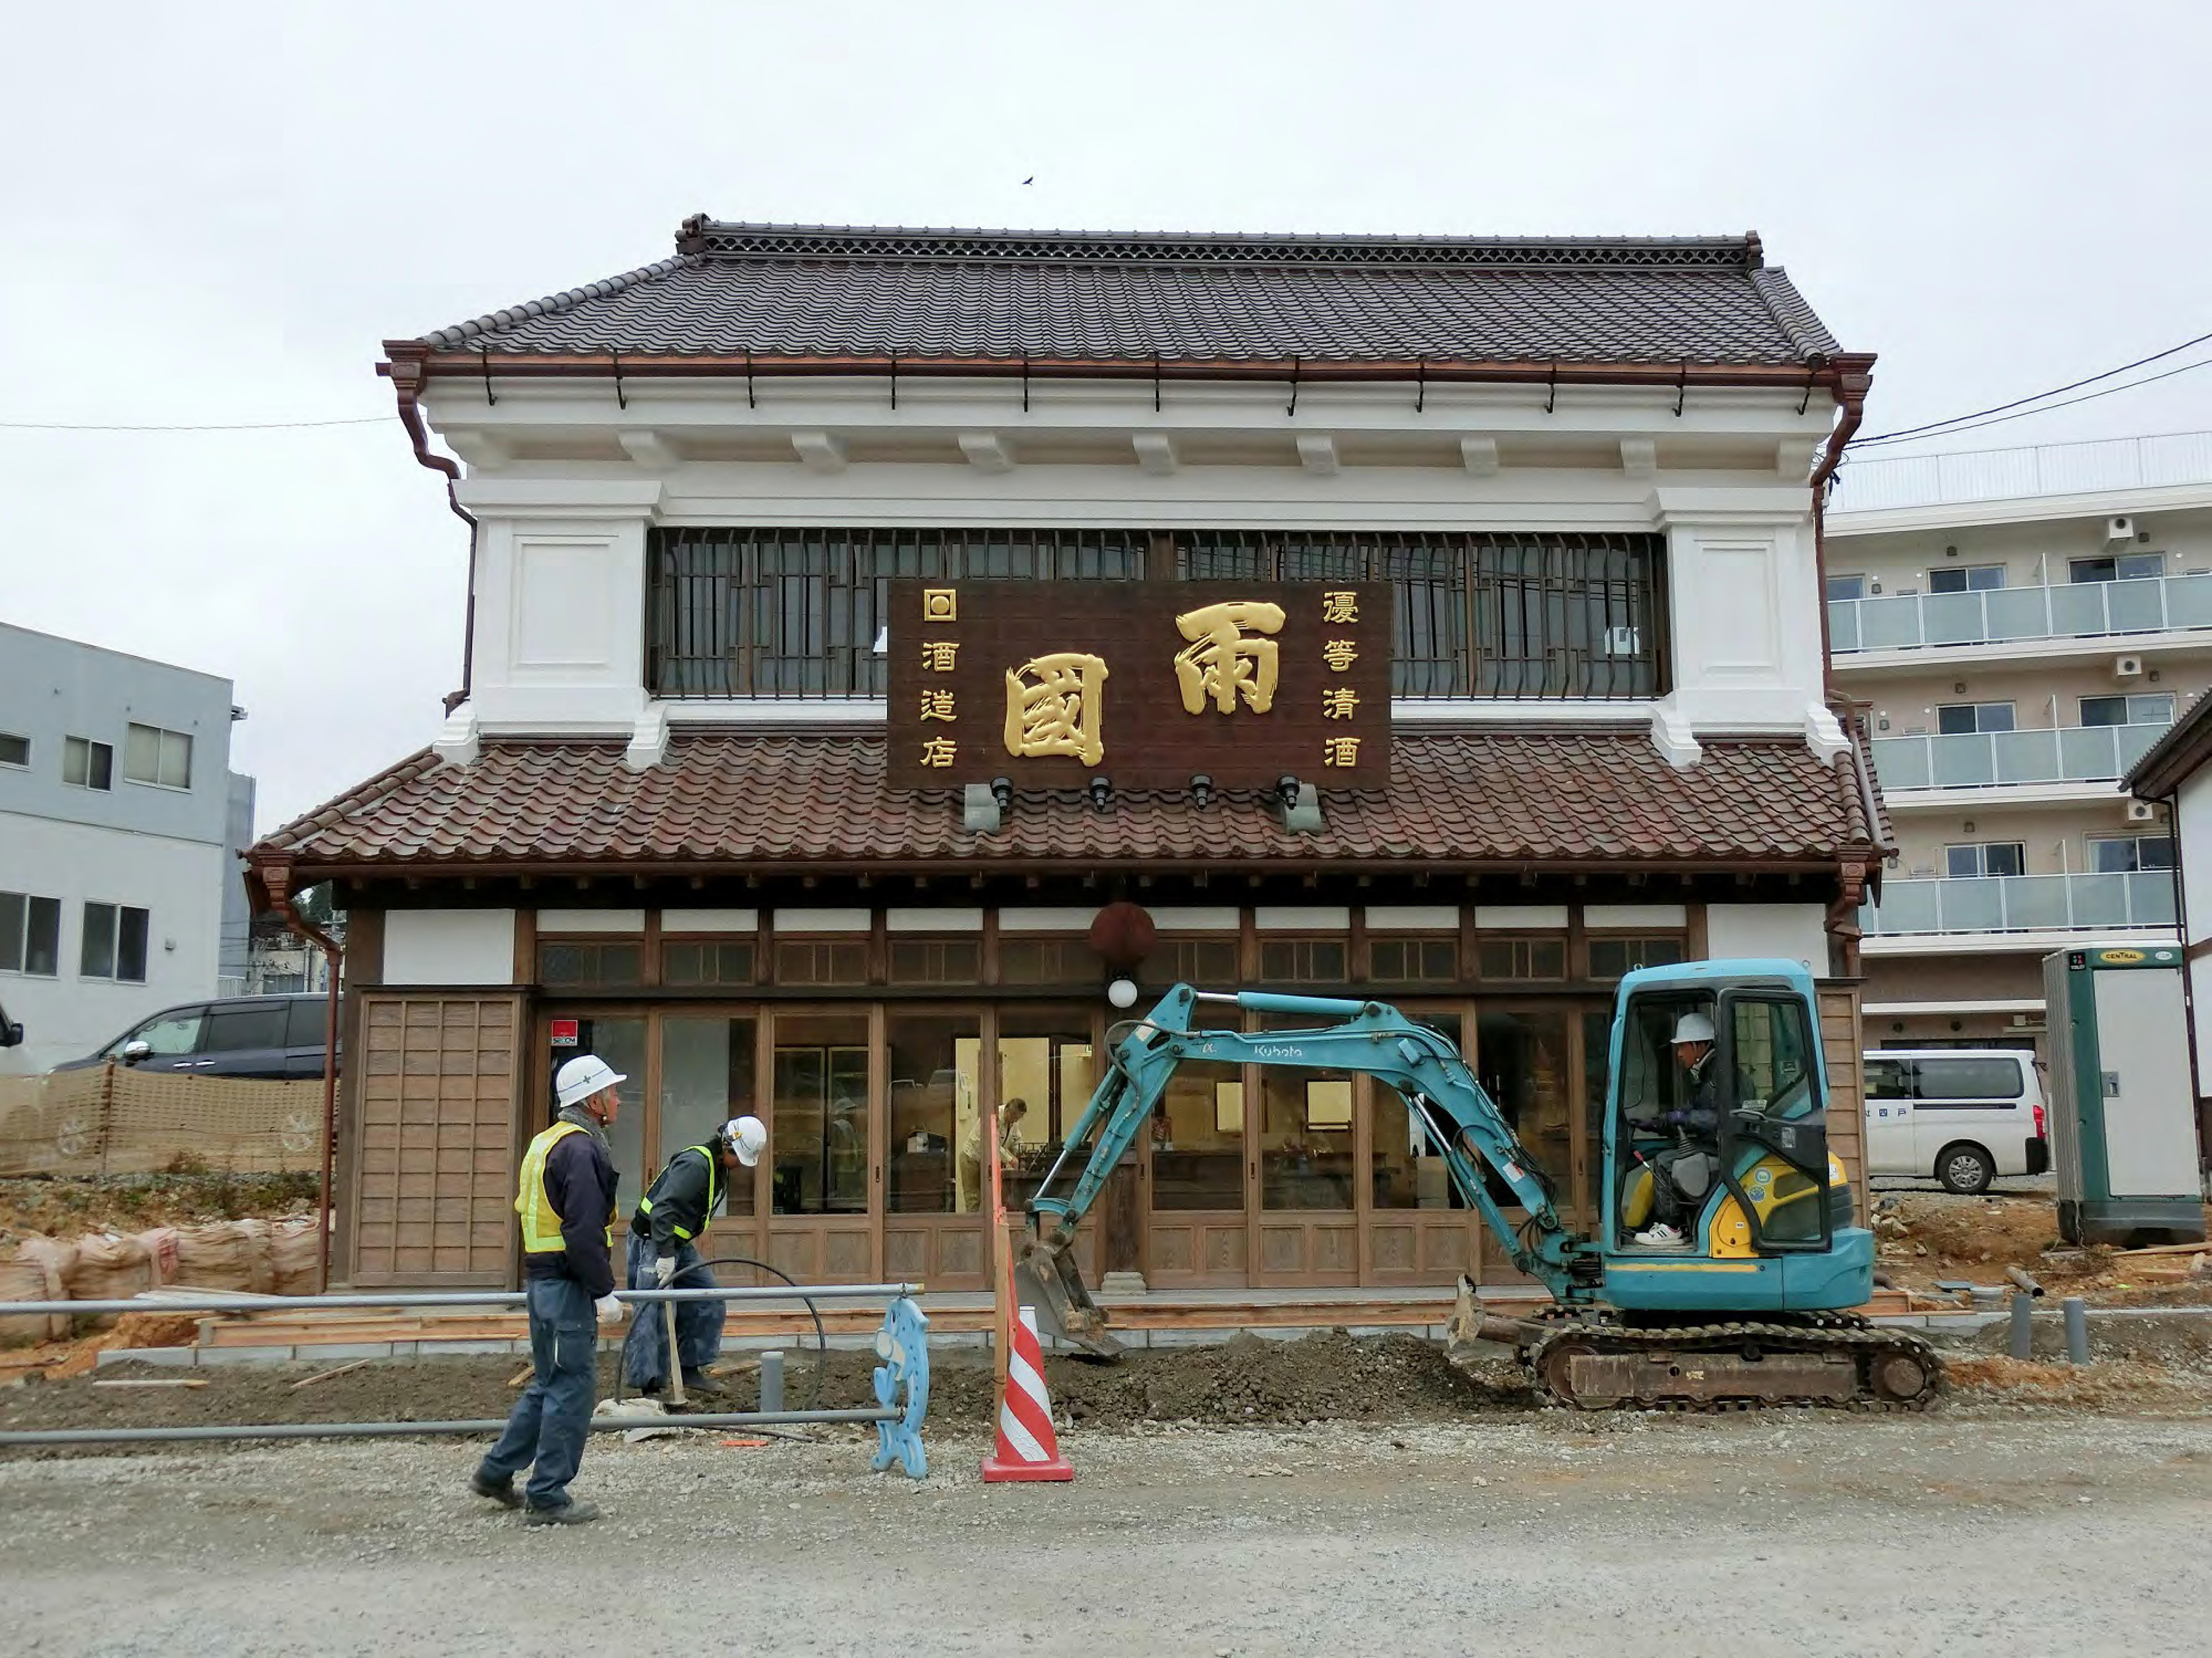 Kakuhoshi façade restored in Kesennuma, Japan.